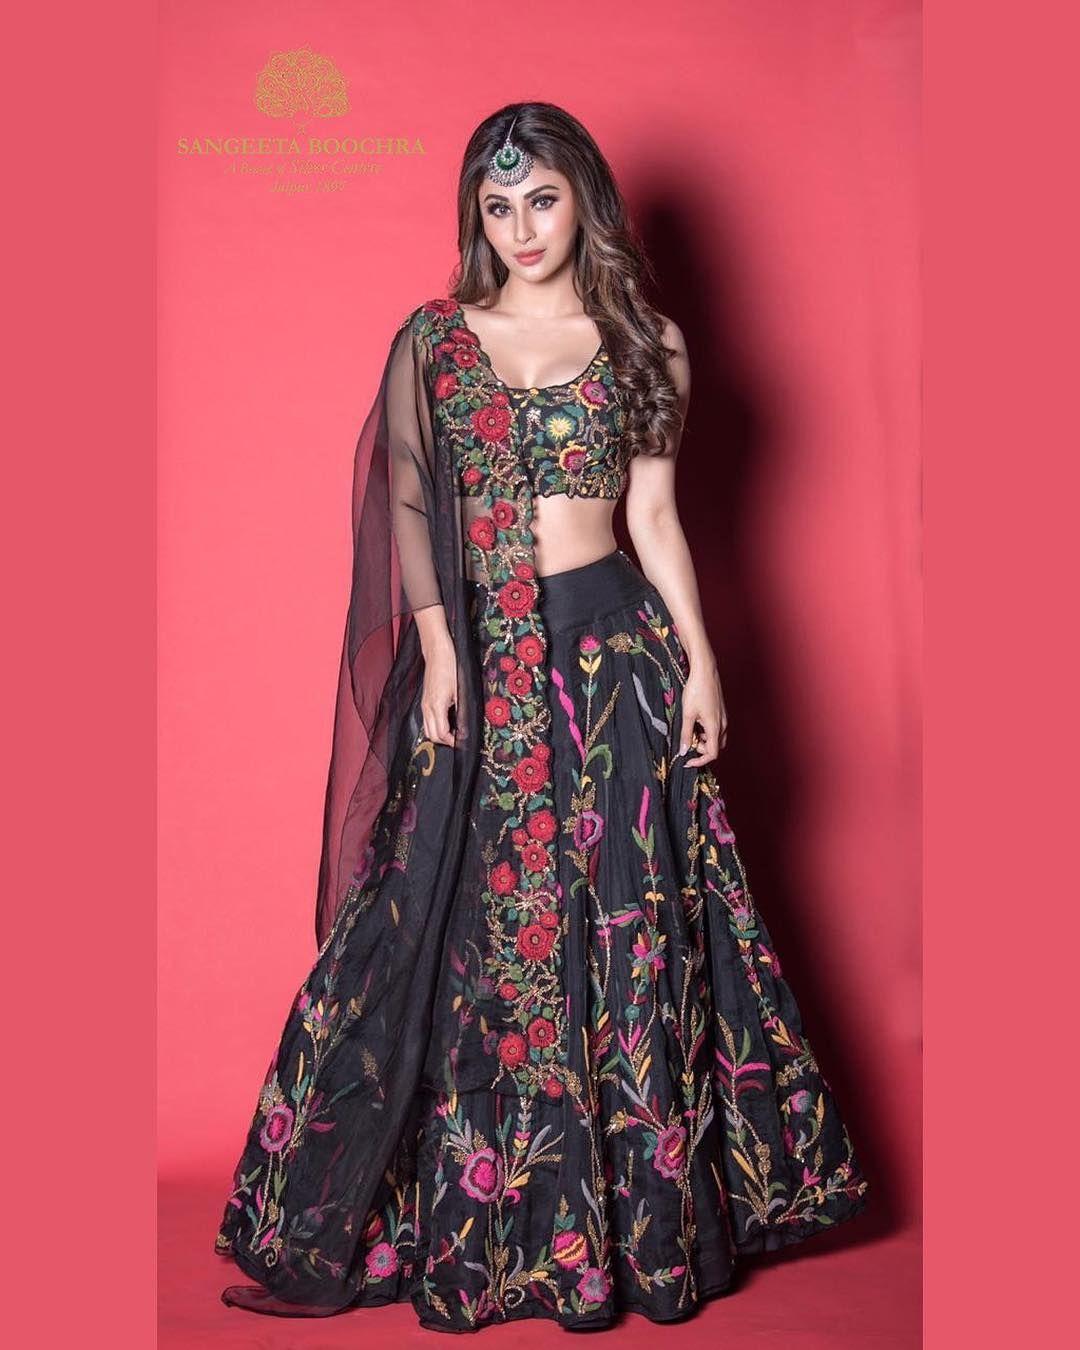 Apr, 2019: sangeeta boochra jewellery on instagram: mouni roy looks